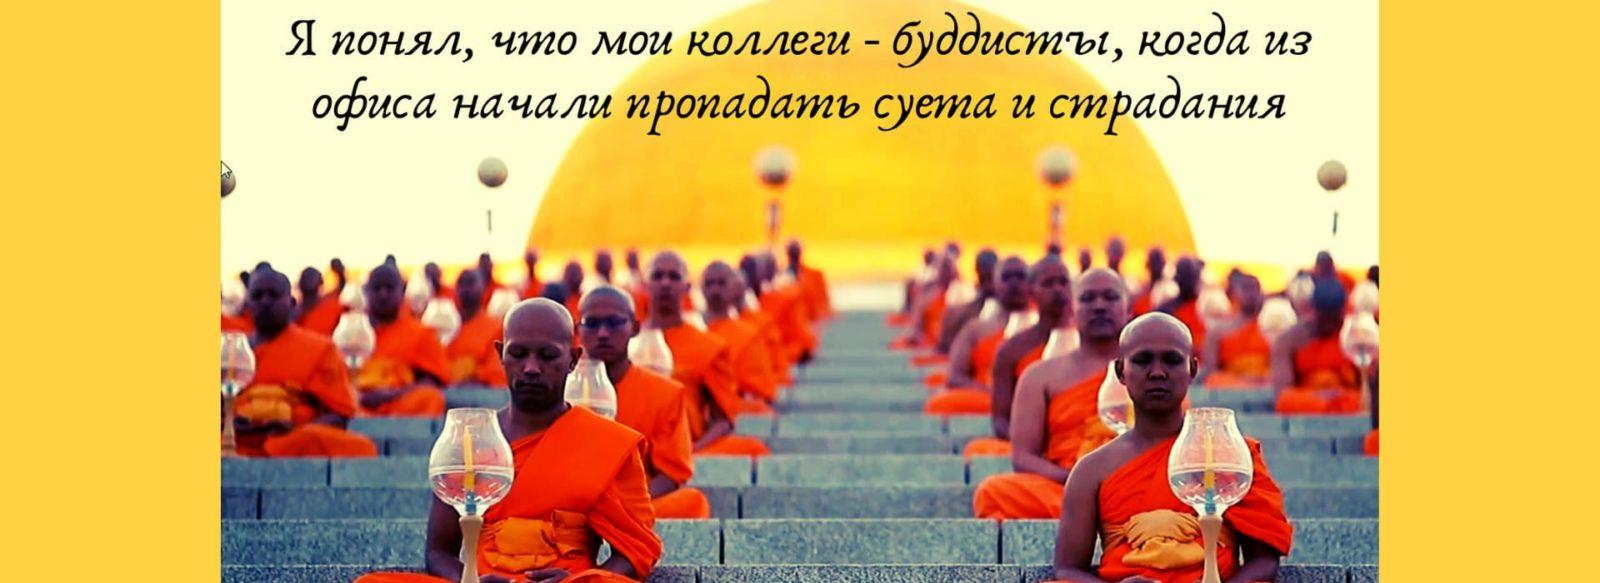 монахи медитируют в позе лотоса